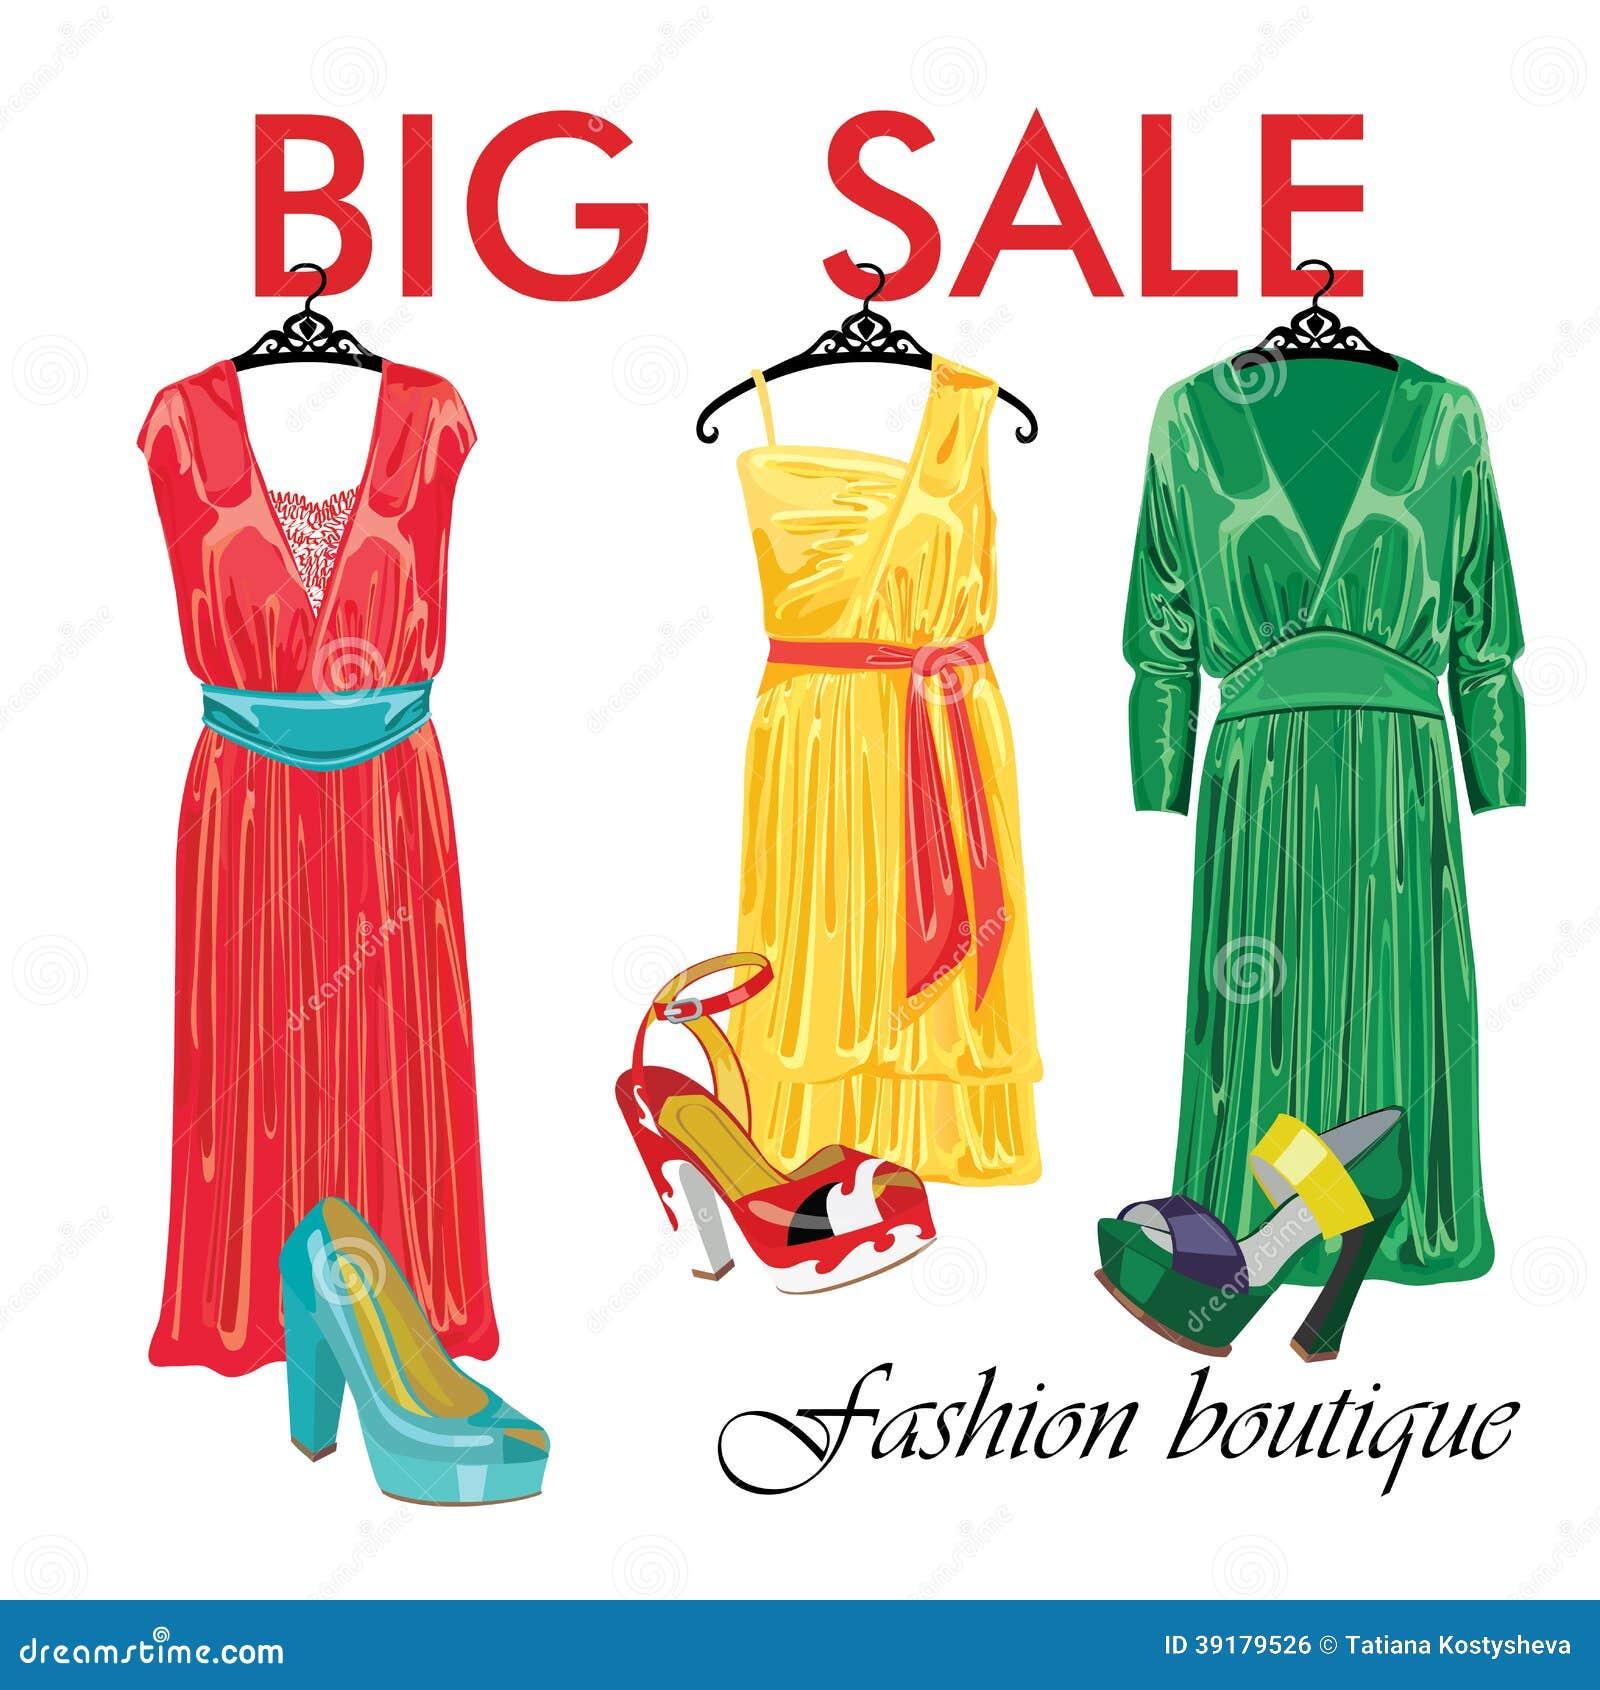 37caa3a8e664 Τρία φορέματα μεταξιού και ανοικτά παπούτσια. Μπουτίκ μόδας. Download  preview